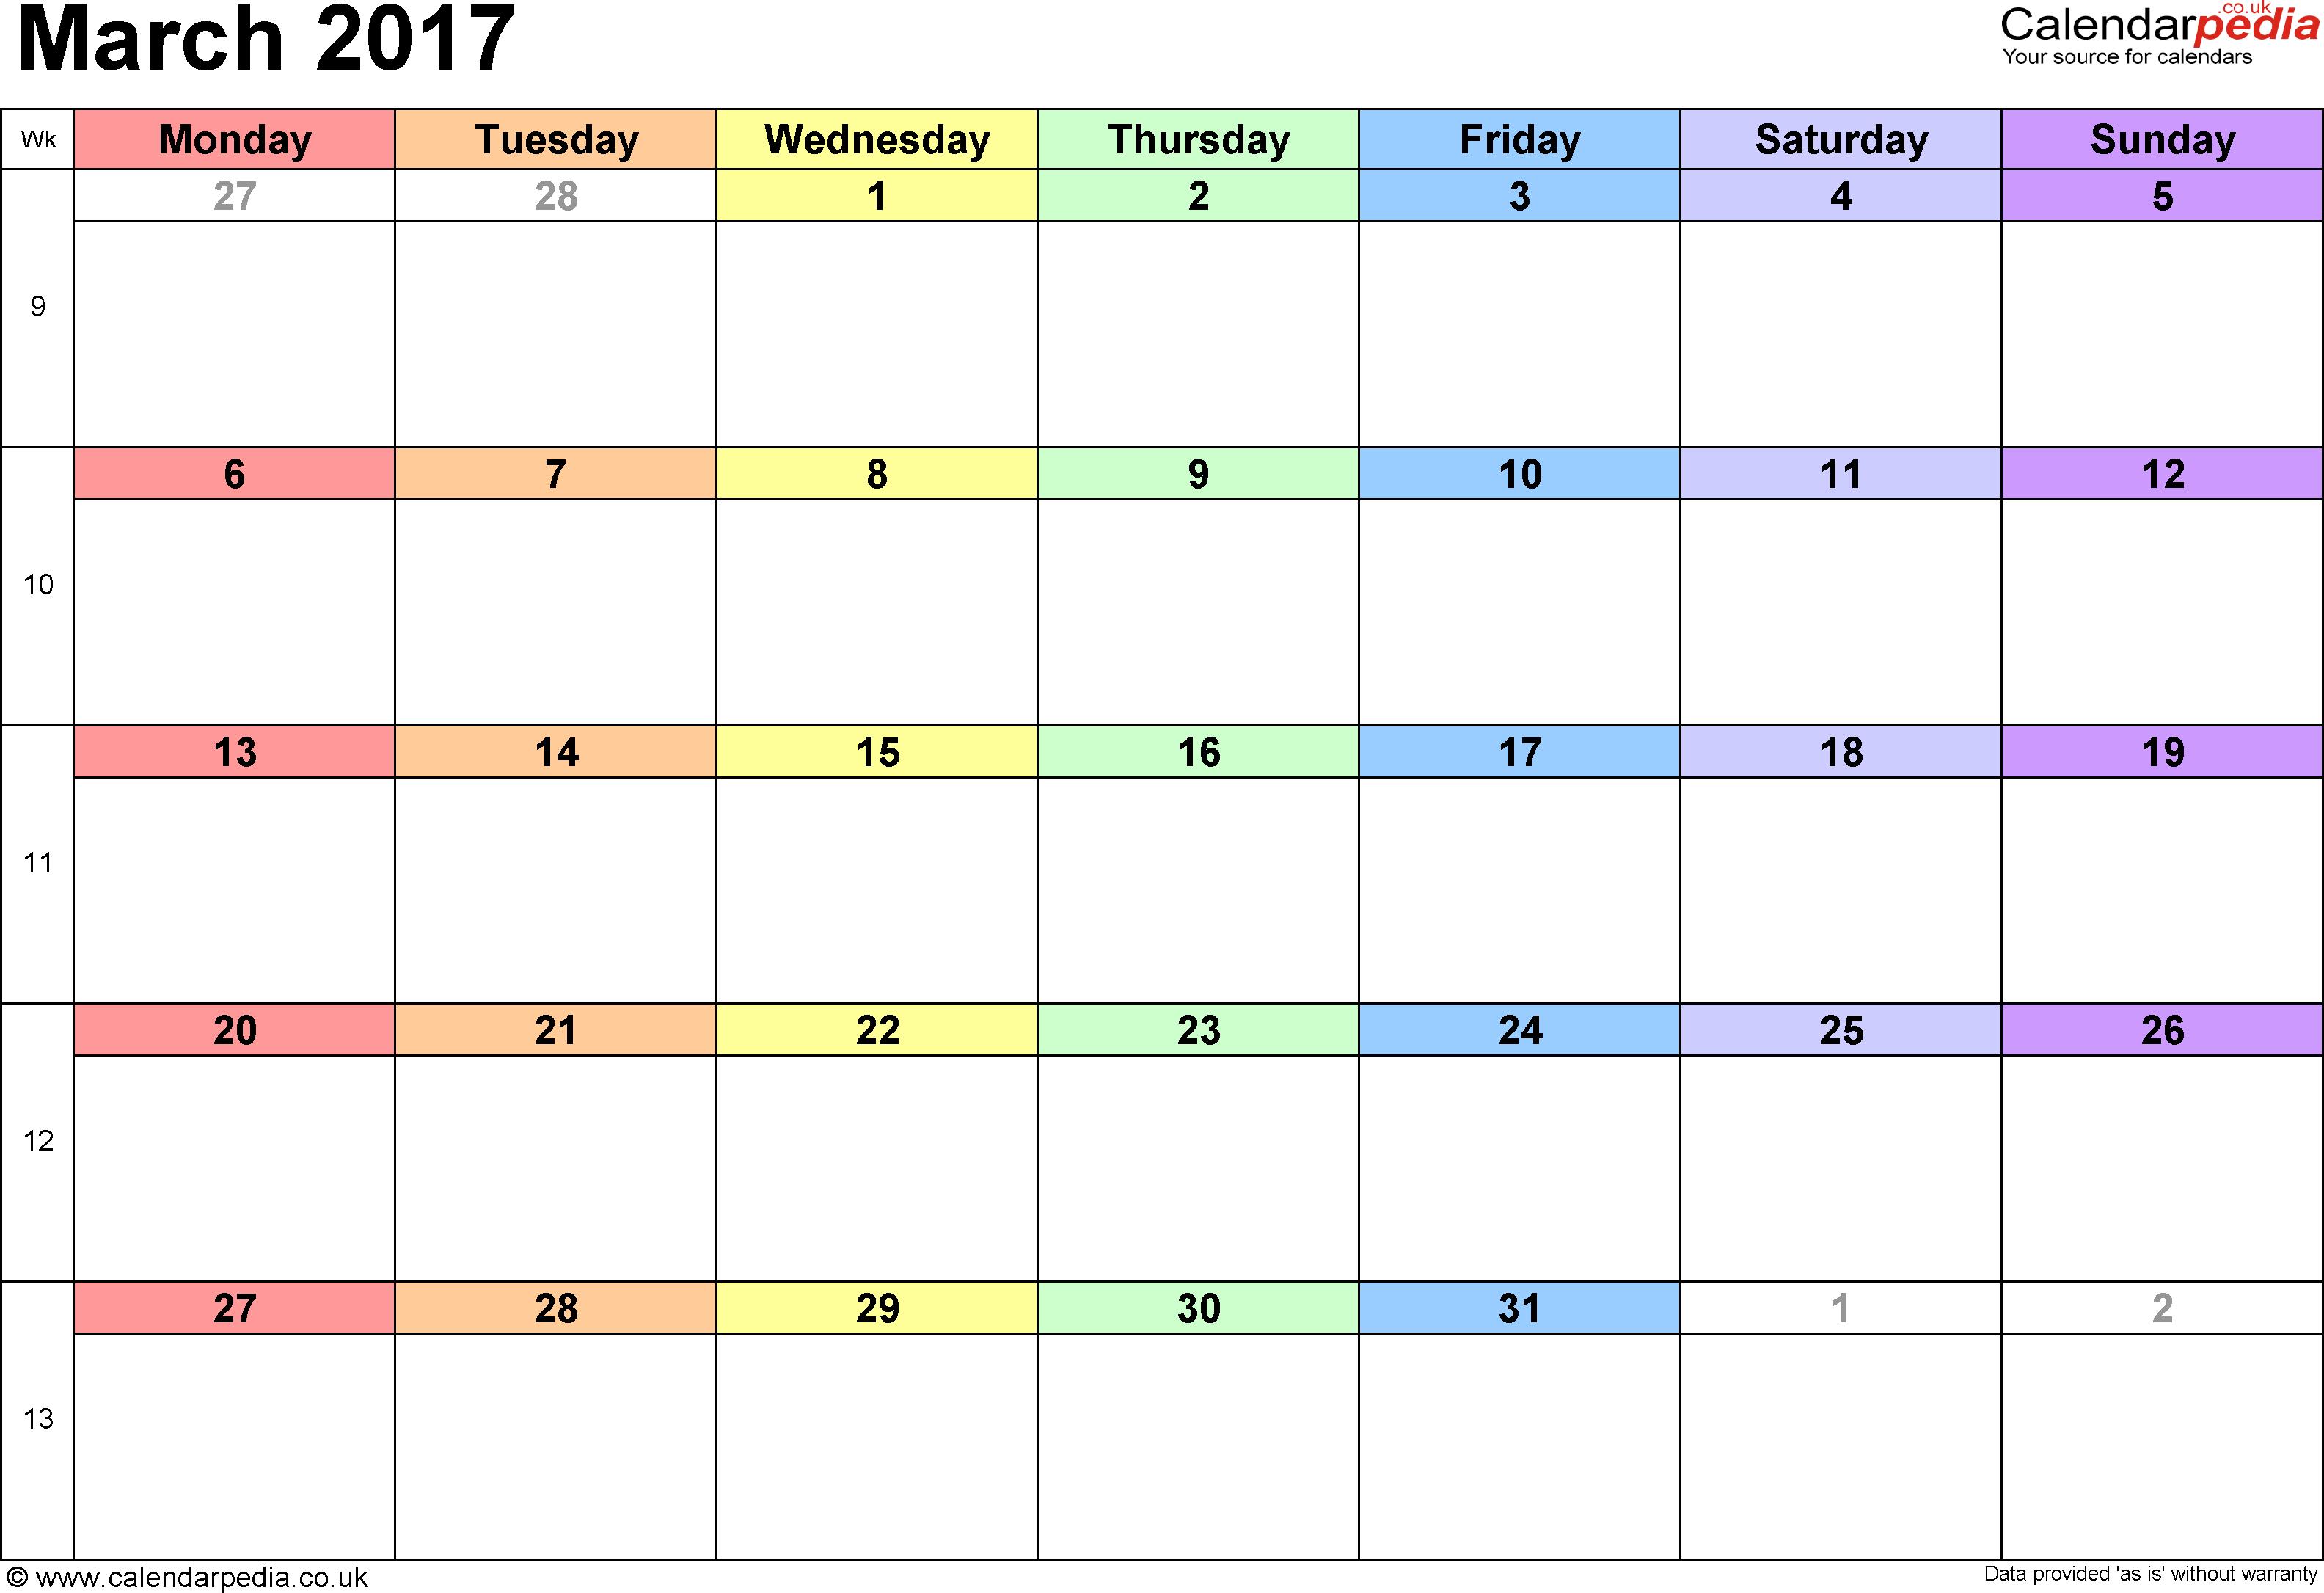 Calendar March 2017 UK, Bank Holidays, Excel/PDF/Word Templates